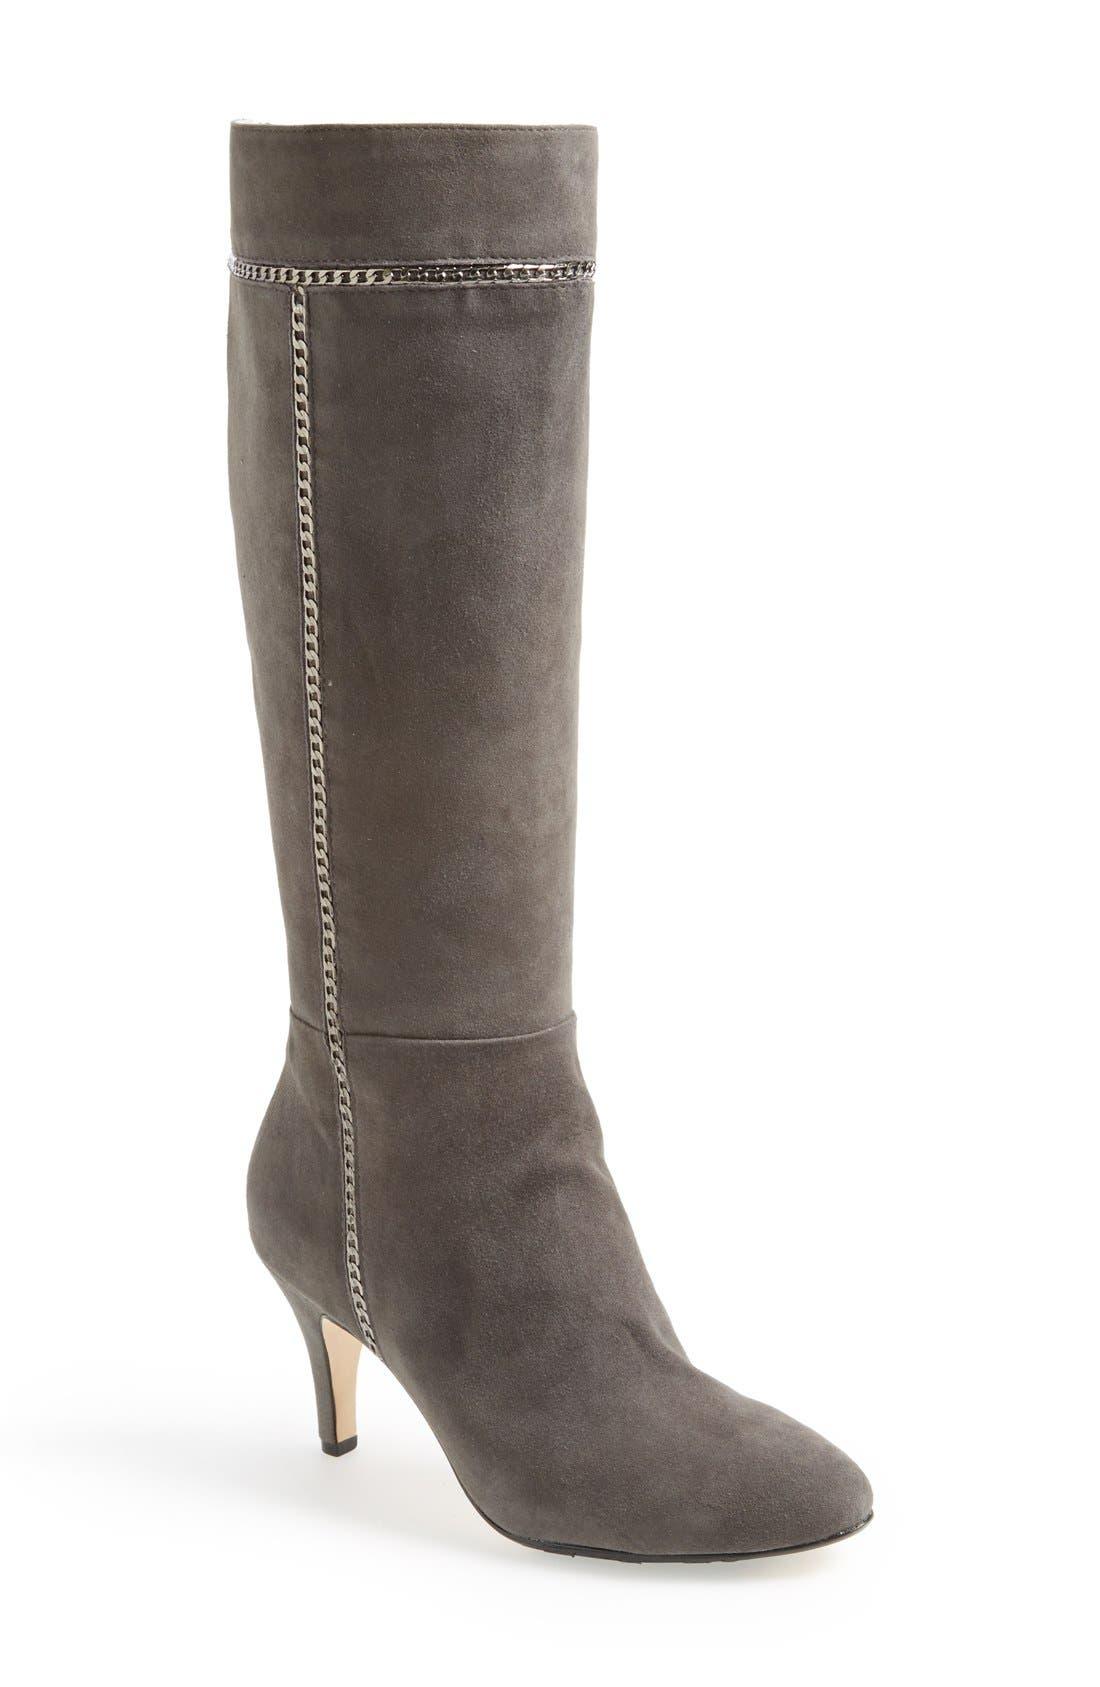 Main Image - Taryn Rose 'Treyes' Tall Suede Boot (Women)